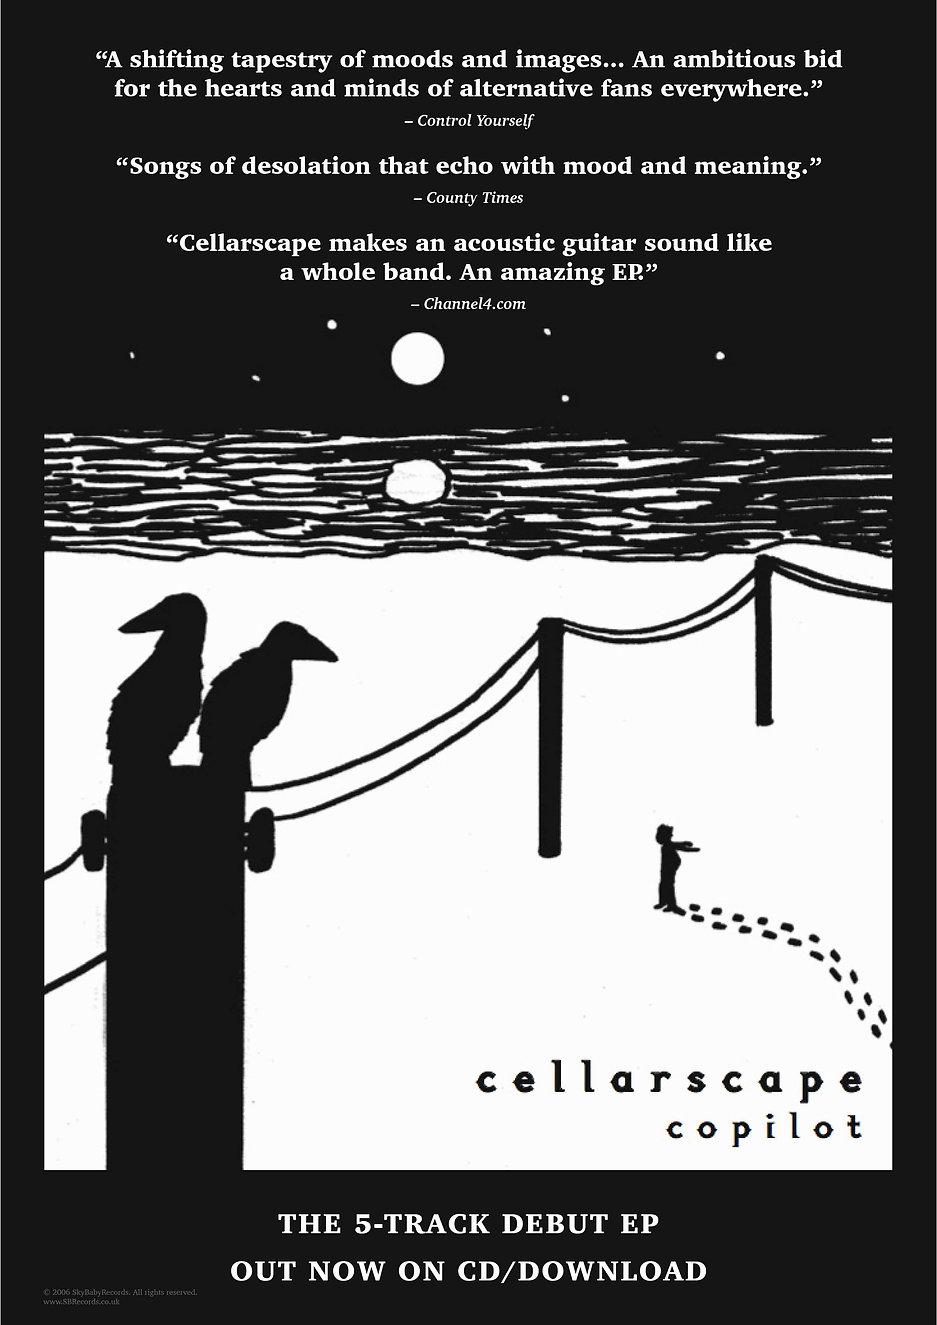 Cellarscape_Copilot_POSTER_PRESS.jpg